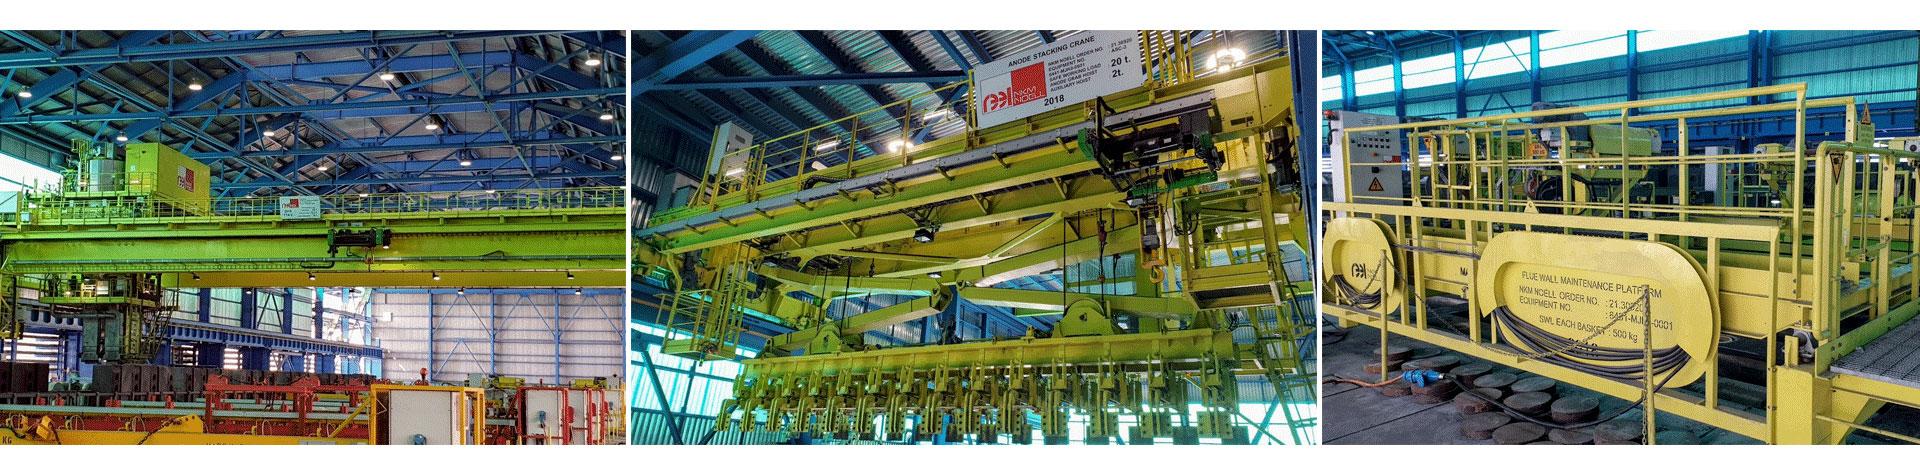 carbon handling system alumnium